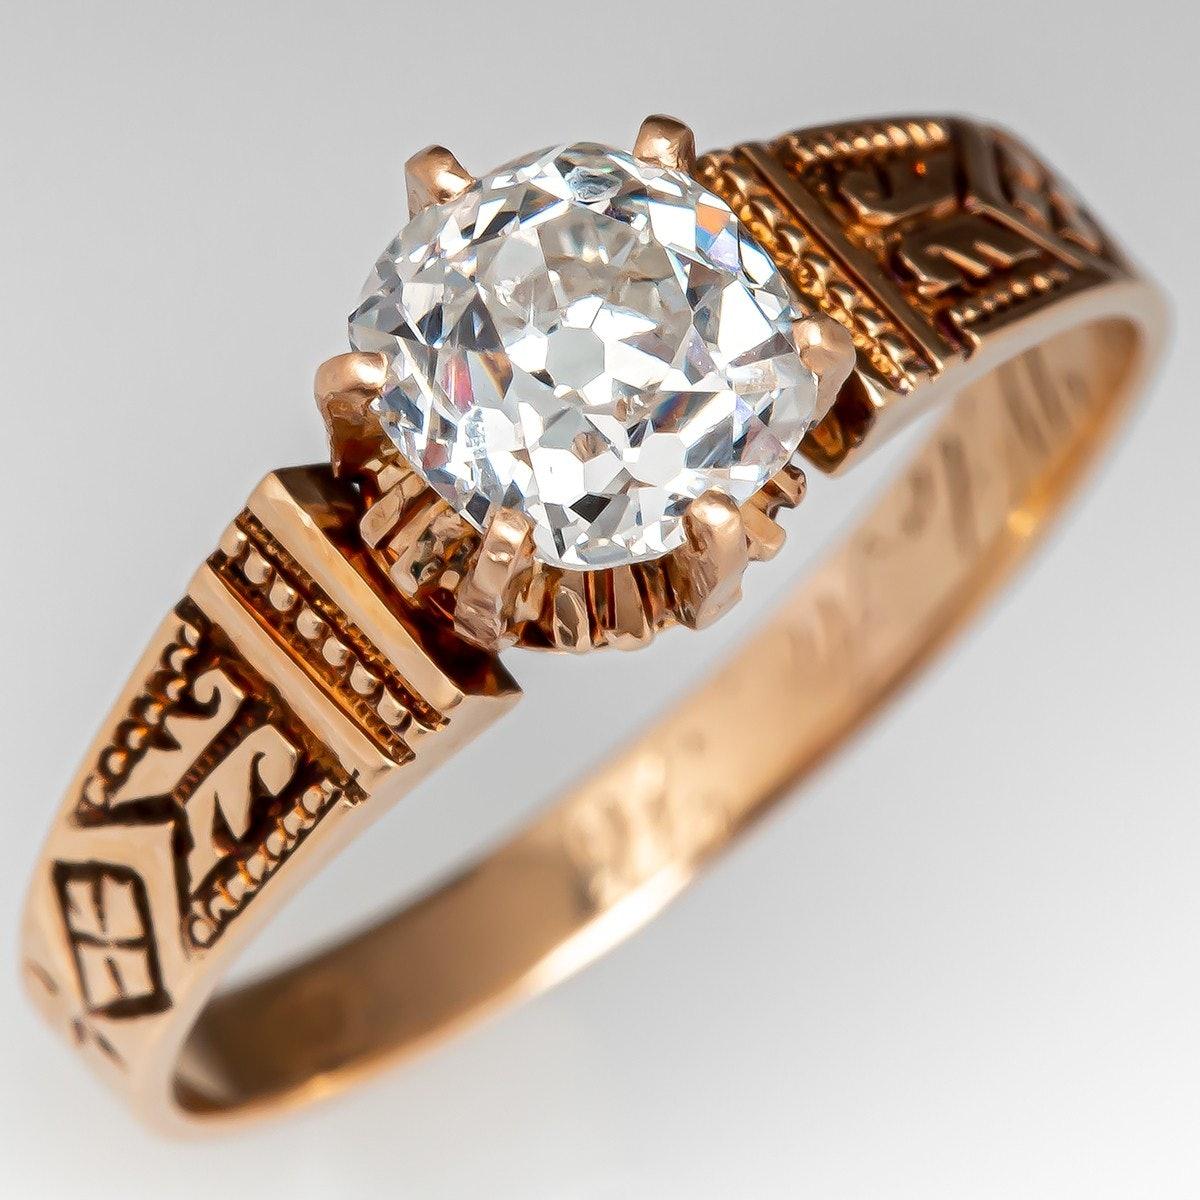 1 Carat Old Mine Cut Diamond Victorian Engagement Ring from EraGem.